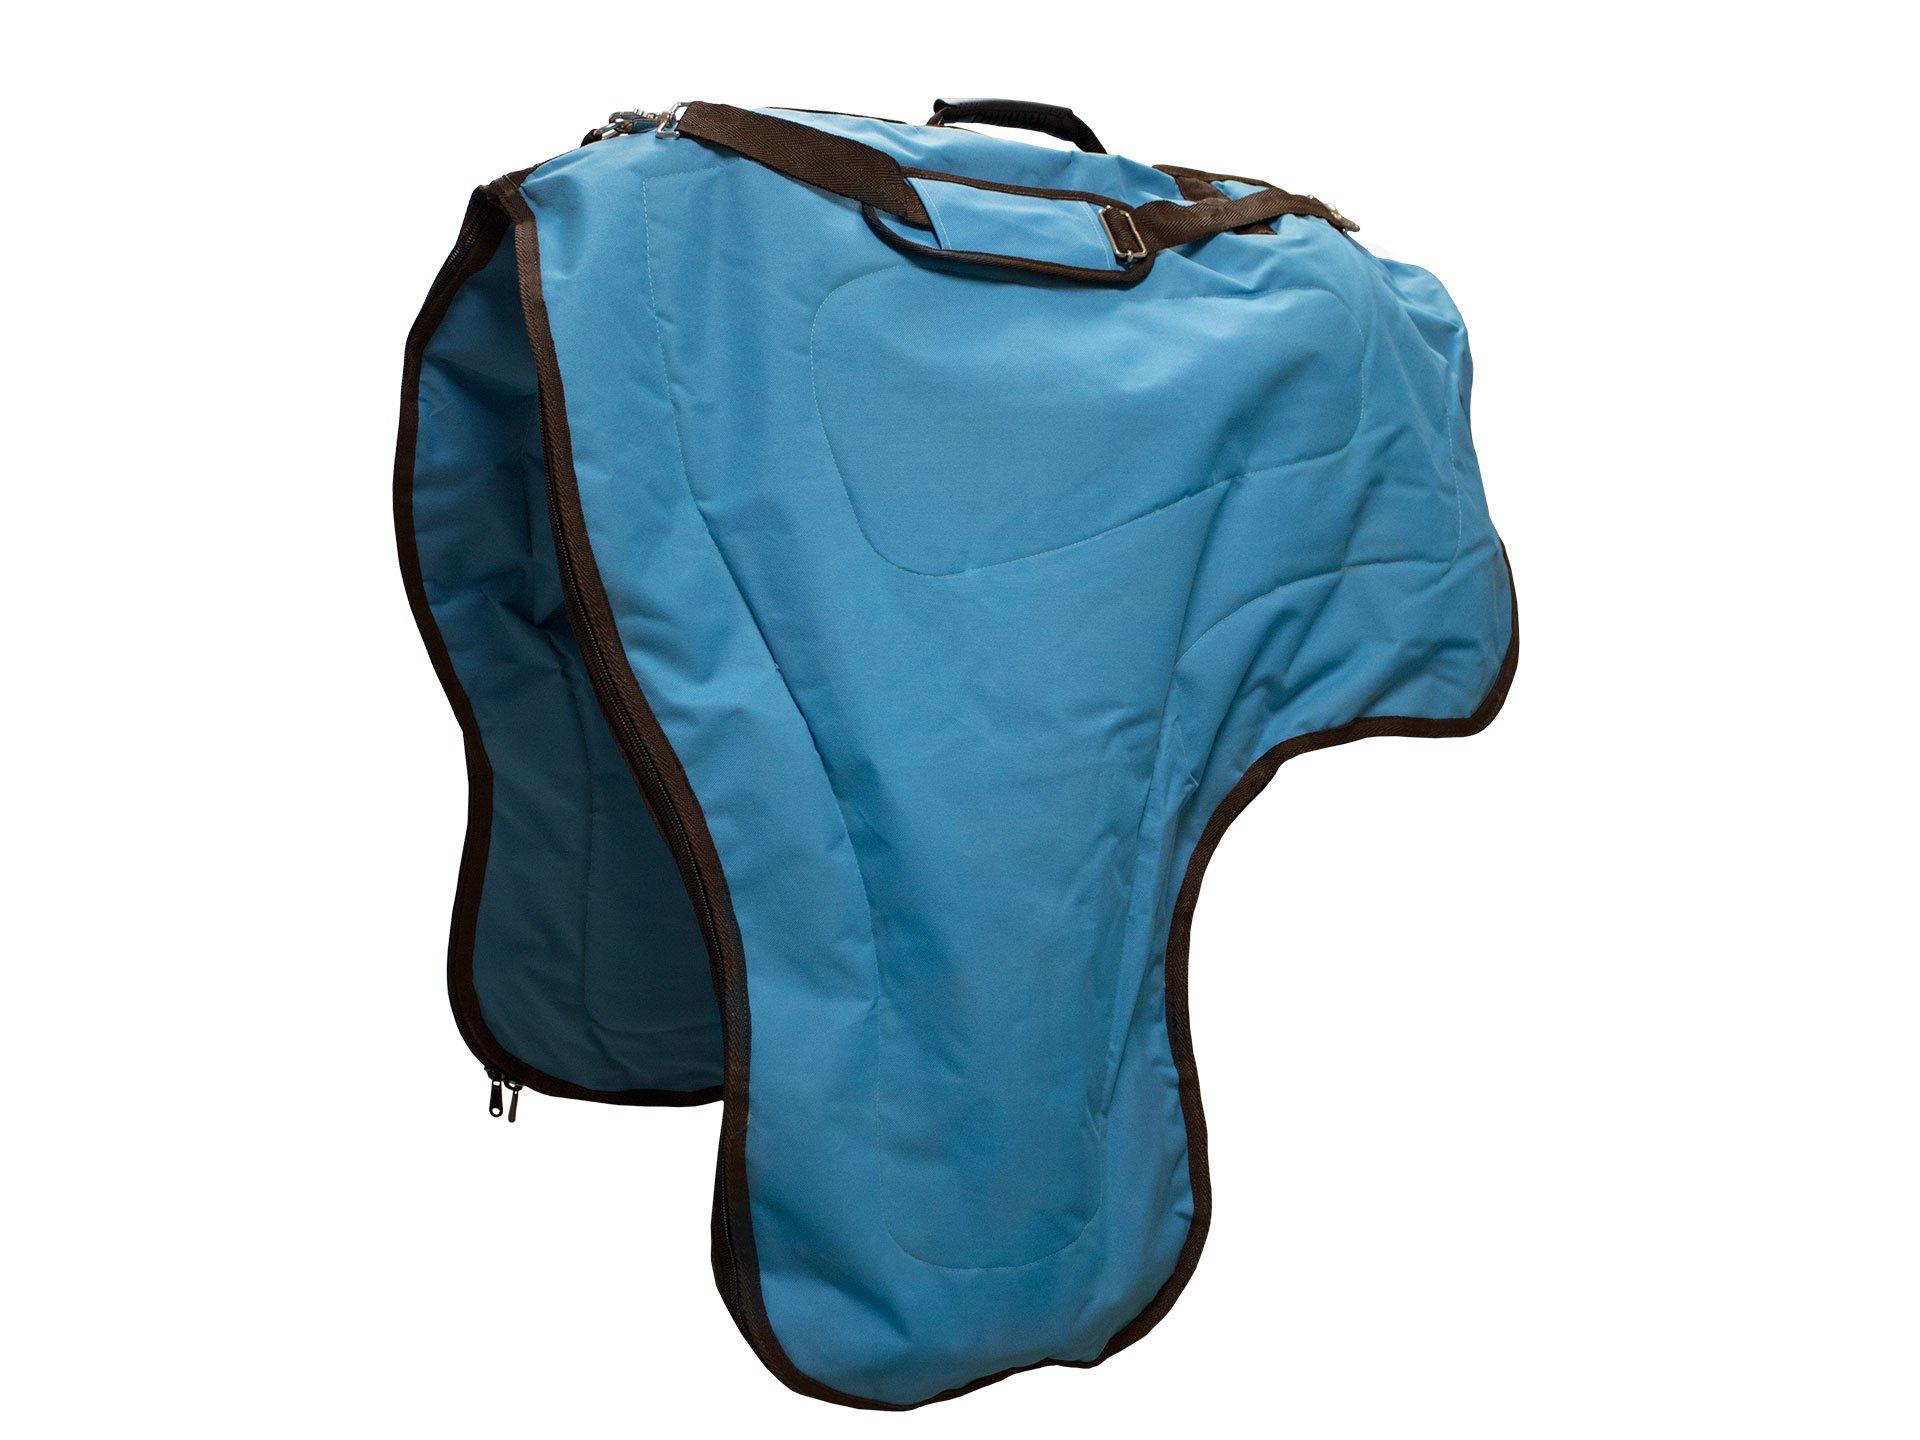 Tahoe Tack 3 Layer Padded Western Horse Saddle Carry Bag Case (Turquoise)